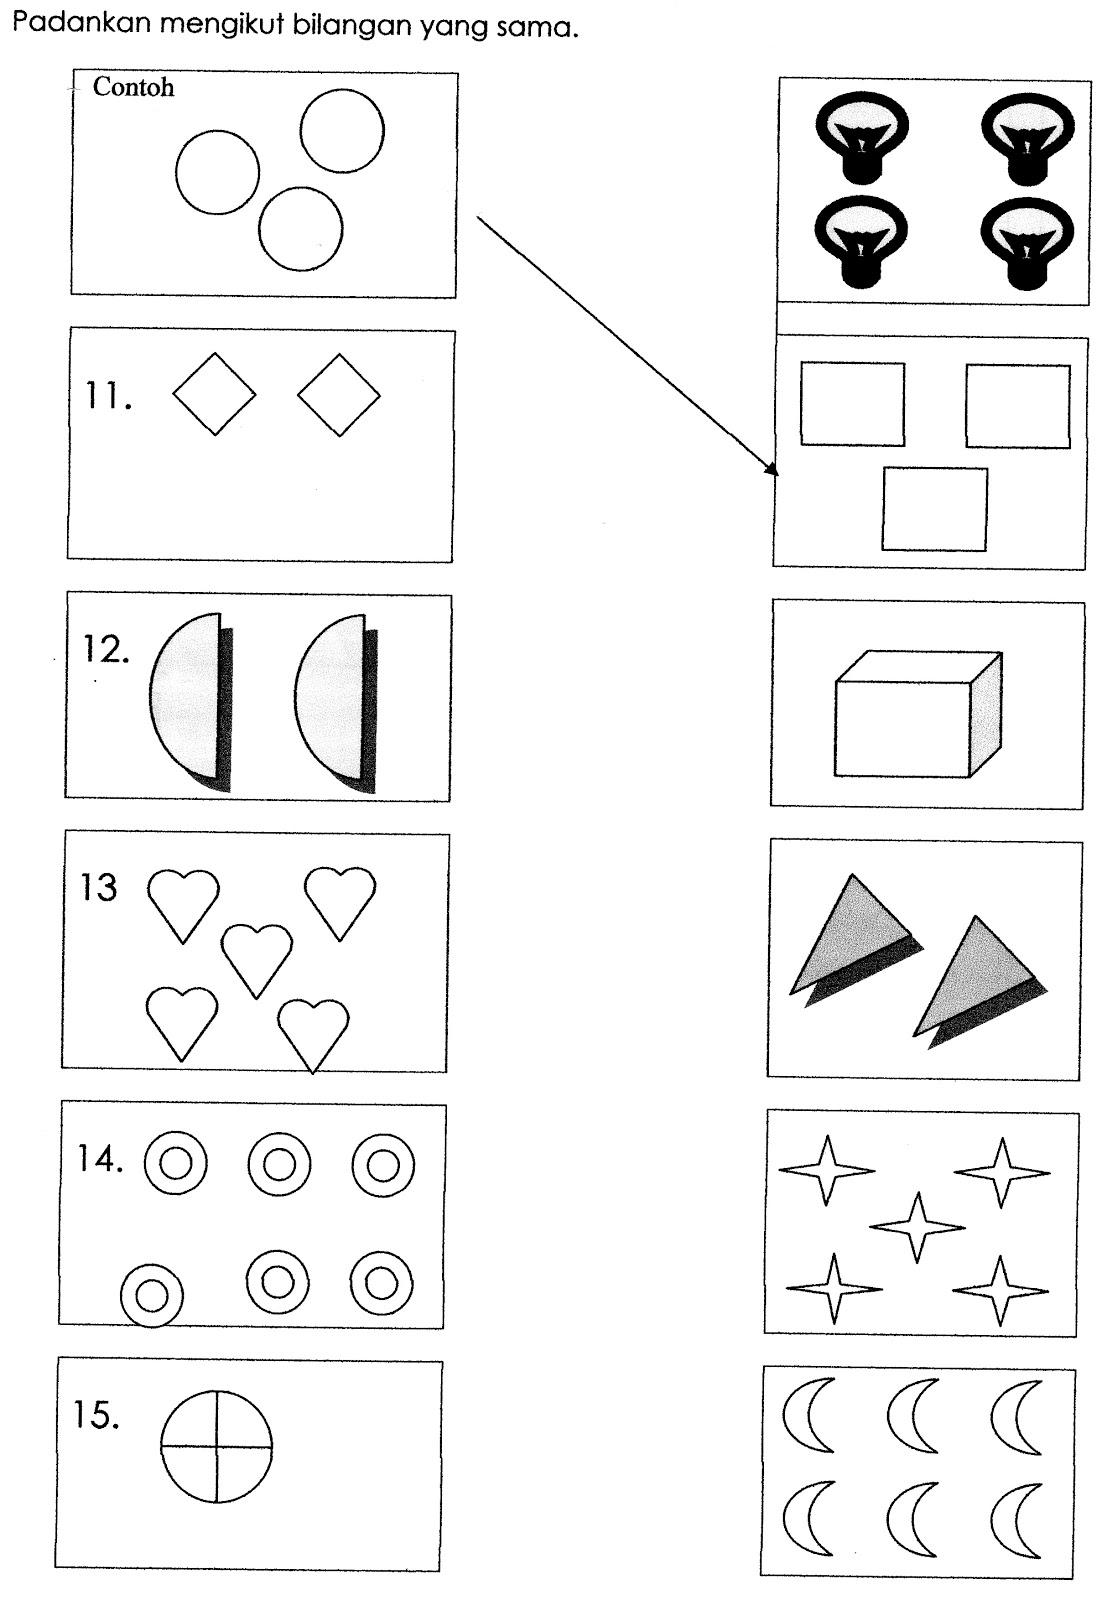 Worksheet Pra Sekolah Printable Worksheets And Activities For Teachers Parents Tutors And Homeschool Families